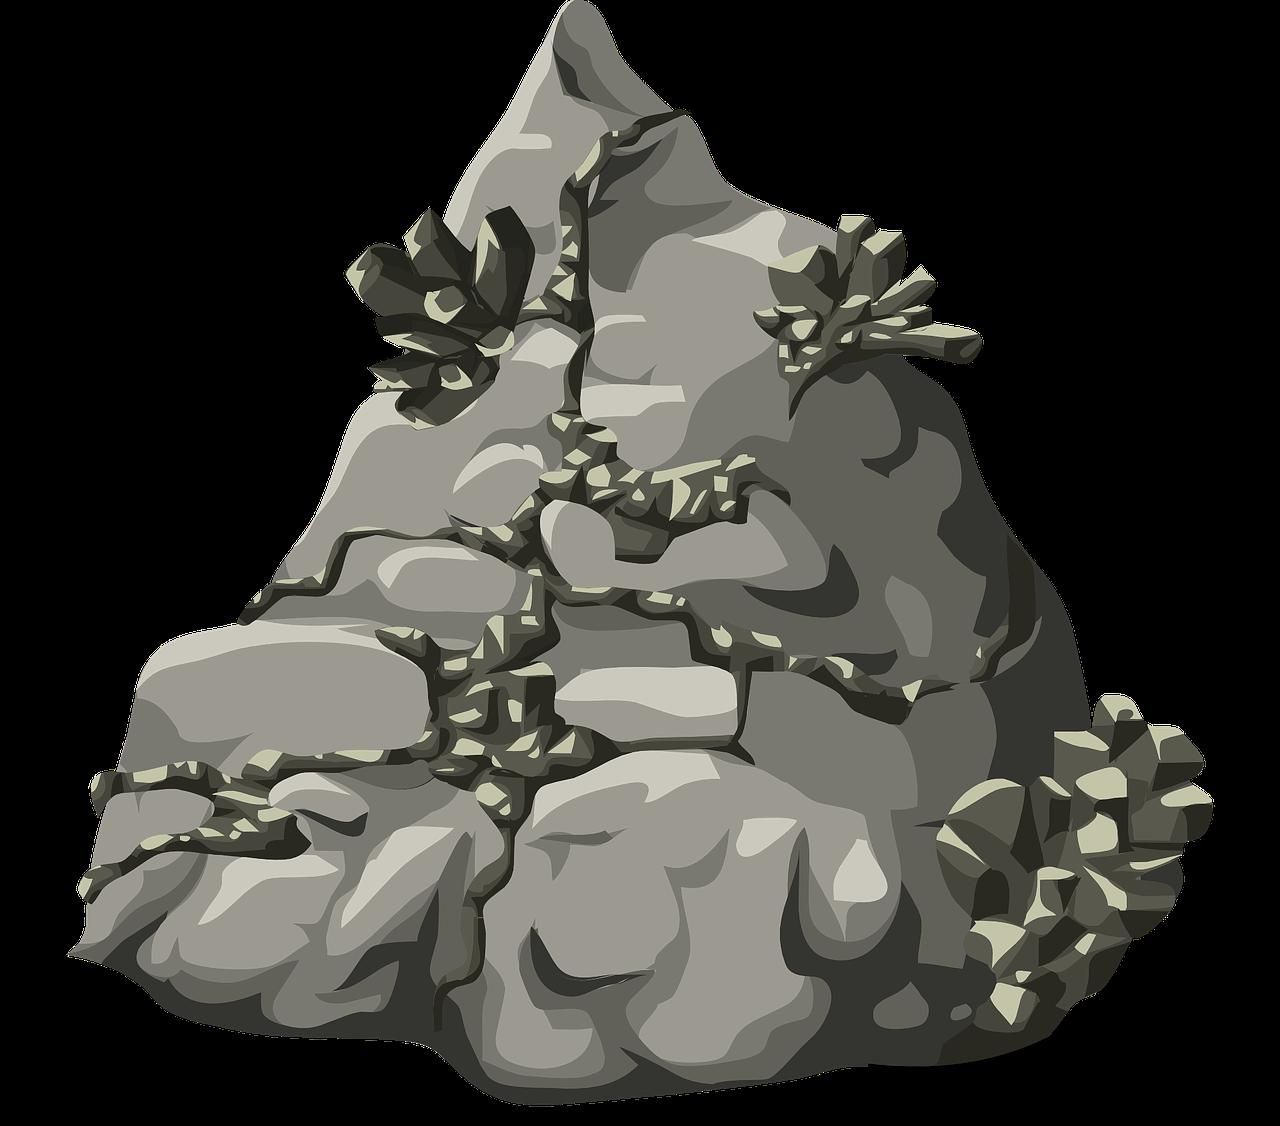 Rocks nature stone gray. Hill clipart story mountain